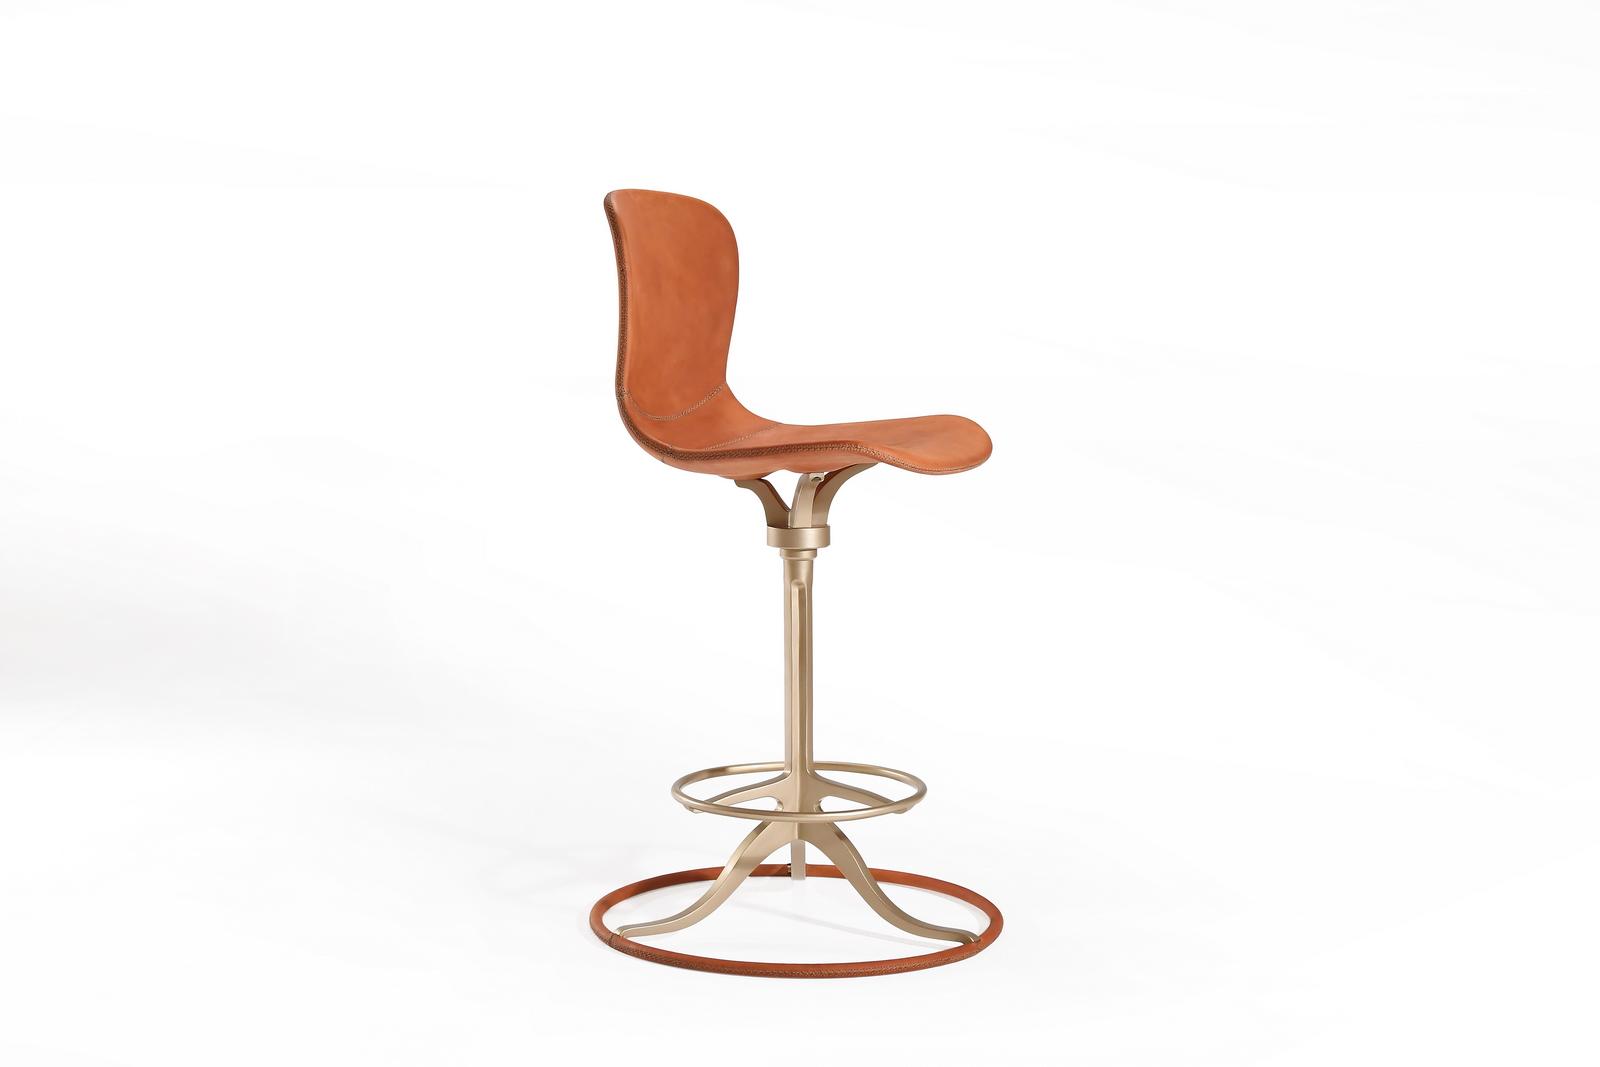 PTendercool-Chair-PT472-BS1-LB-210325-02